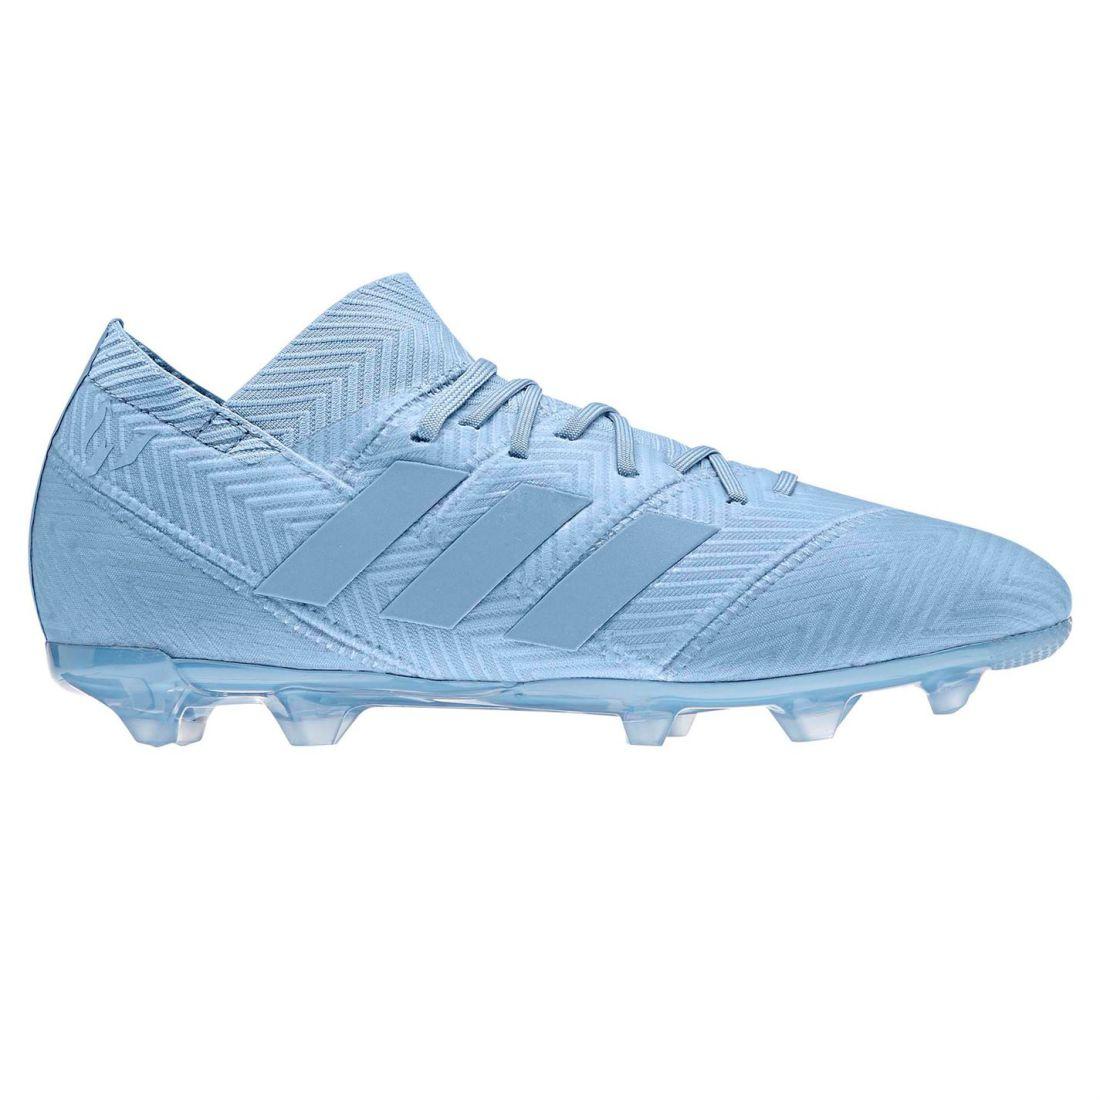 435f13a65588 adidas Kids Boys Nemeziz Messi 18.1 Junior FG Football Boots Firm ...